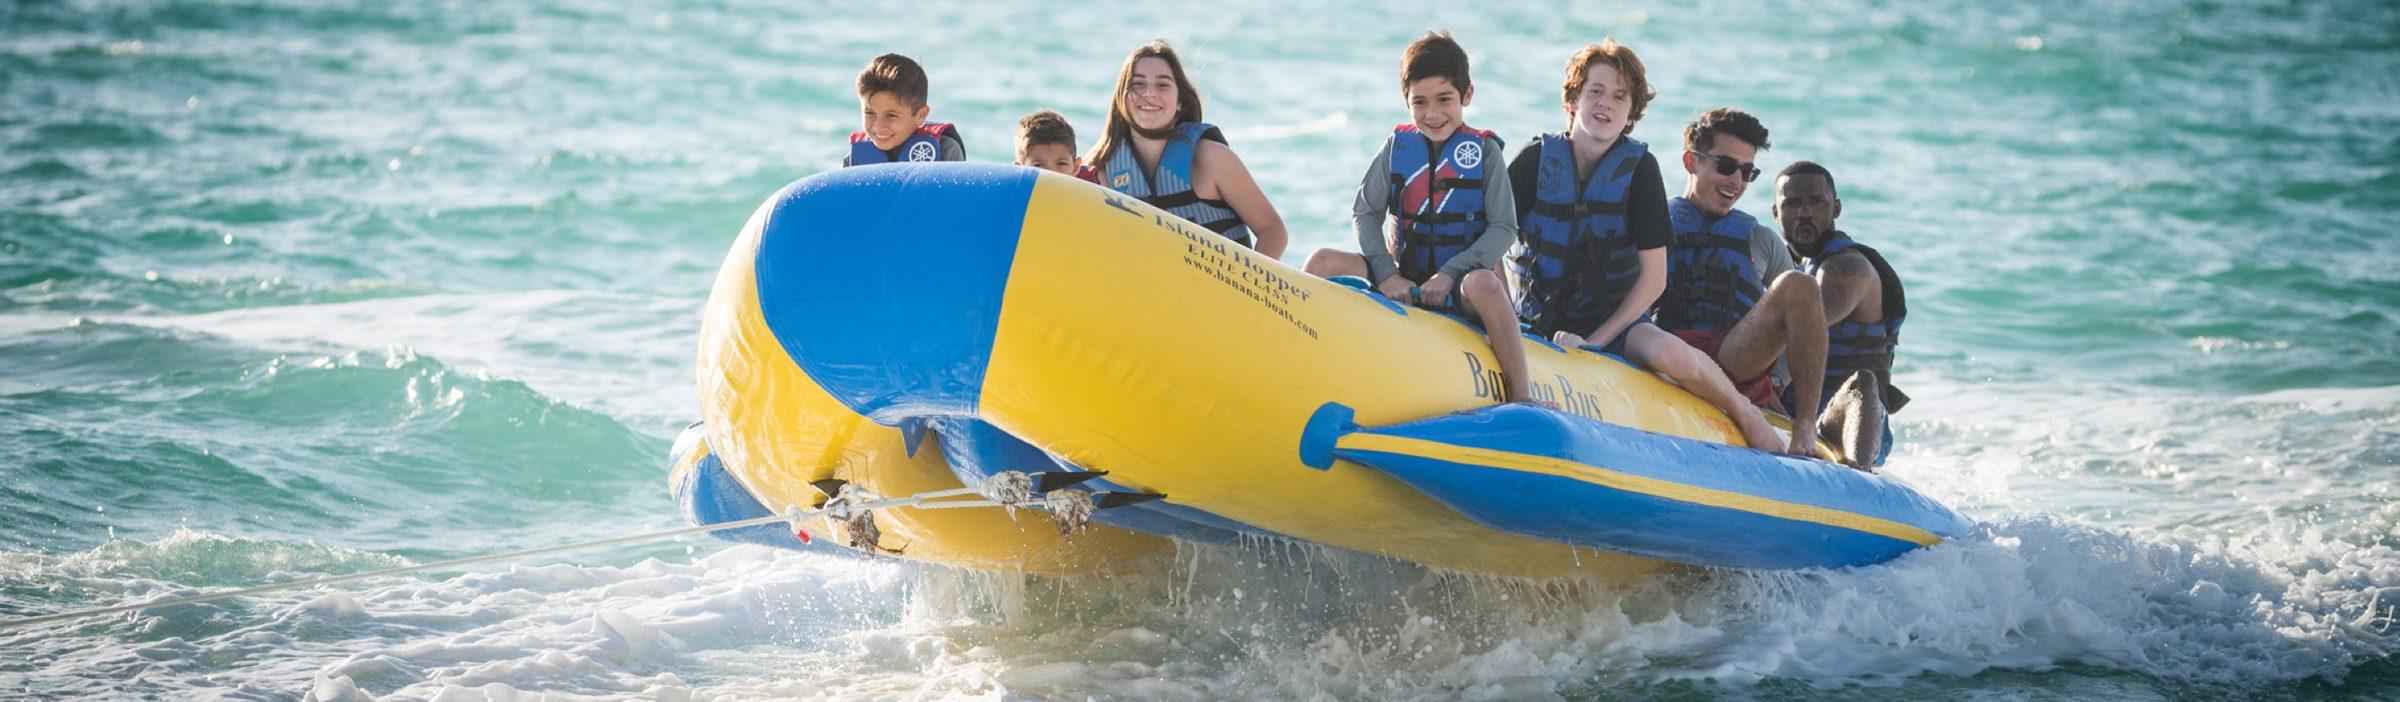 BouYah Watersports - Hilton Clearwater image 2